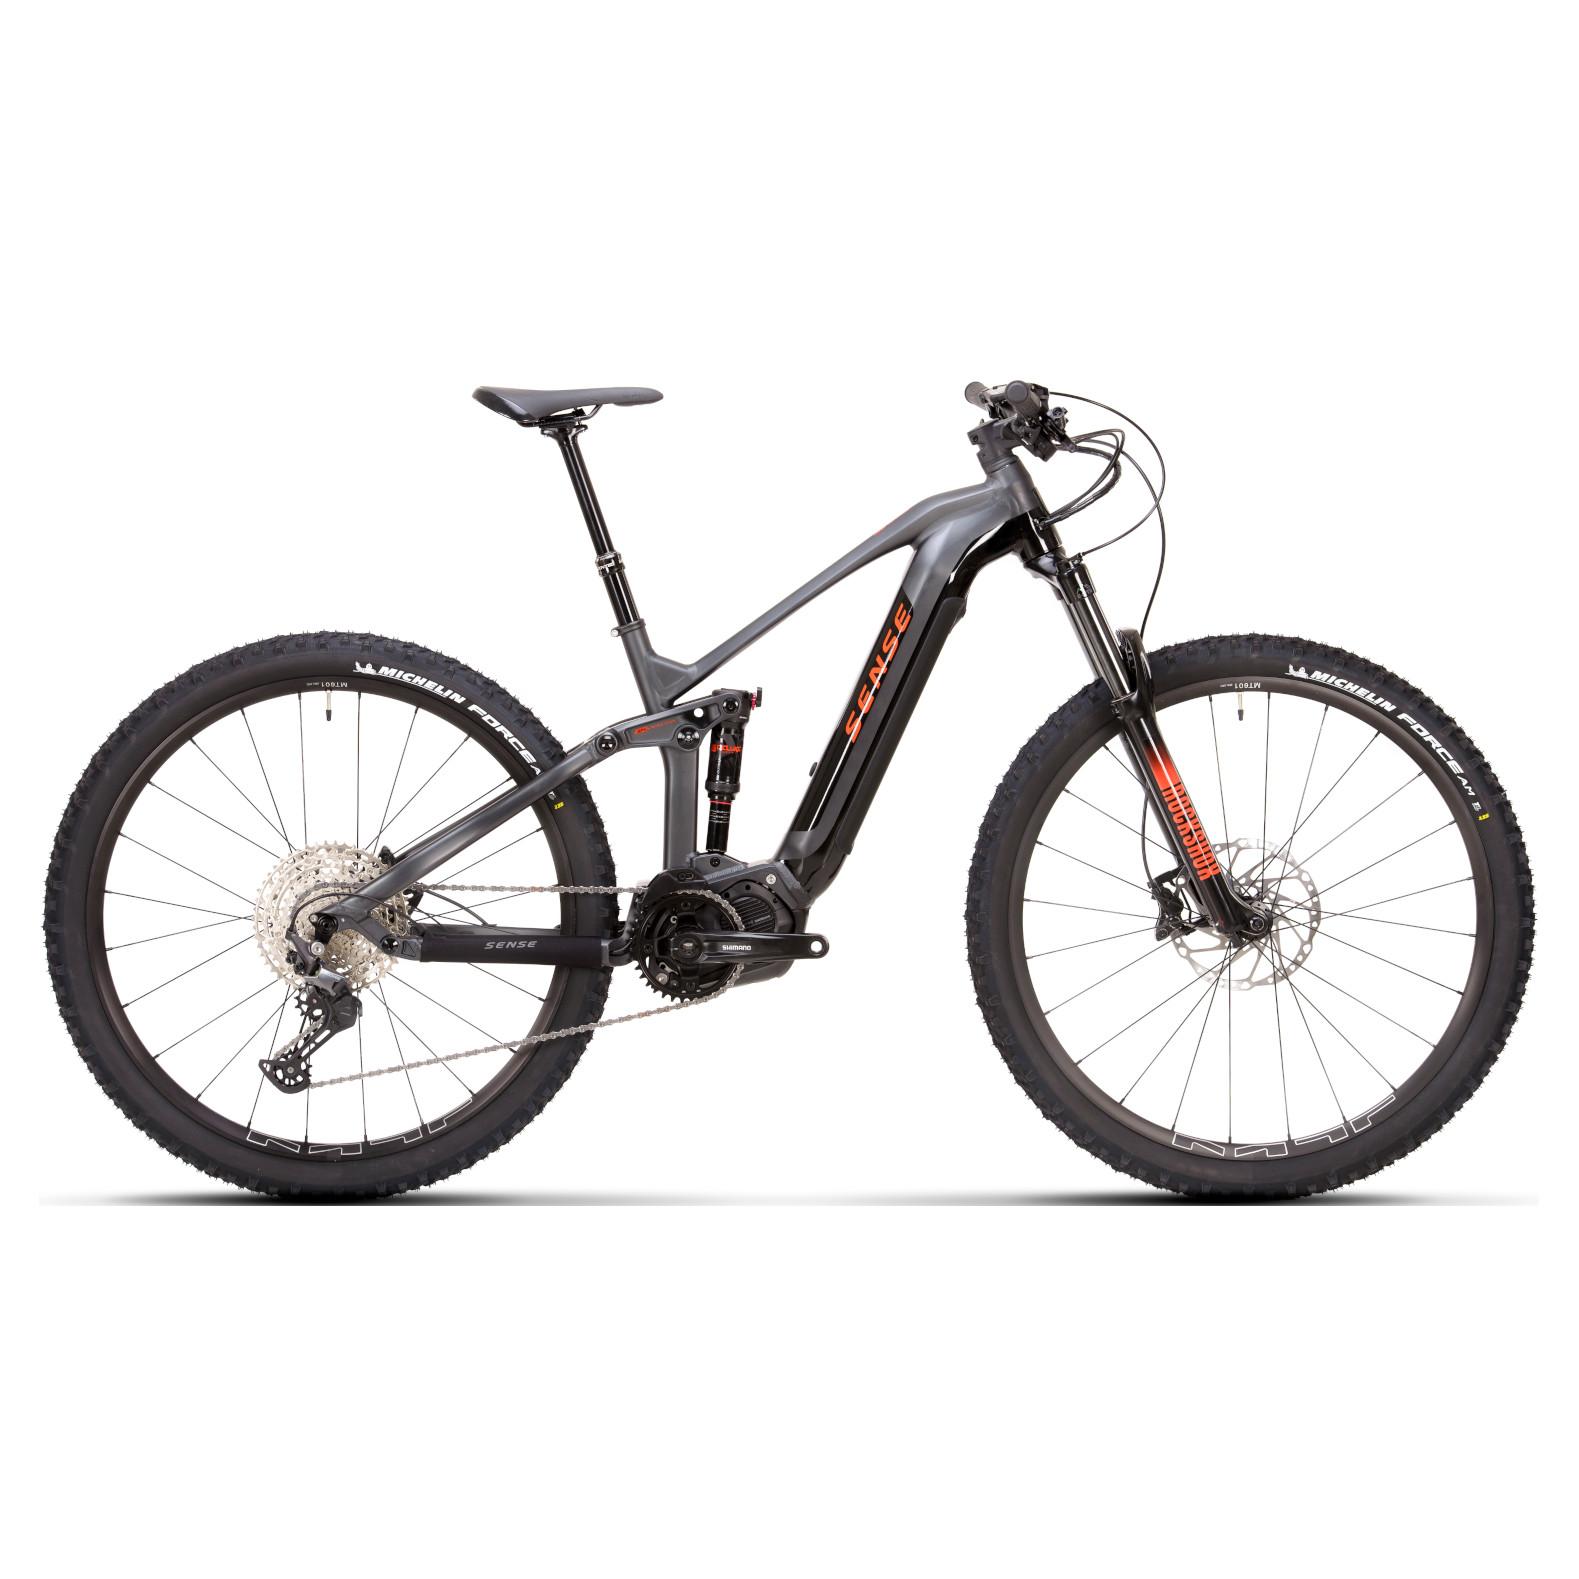 Bicicleta Elétrica MTB Sense Impulse E-Trail Comp 2021